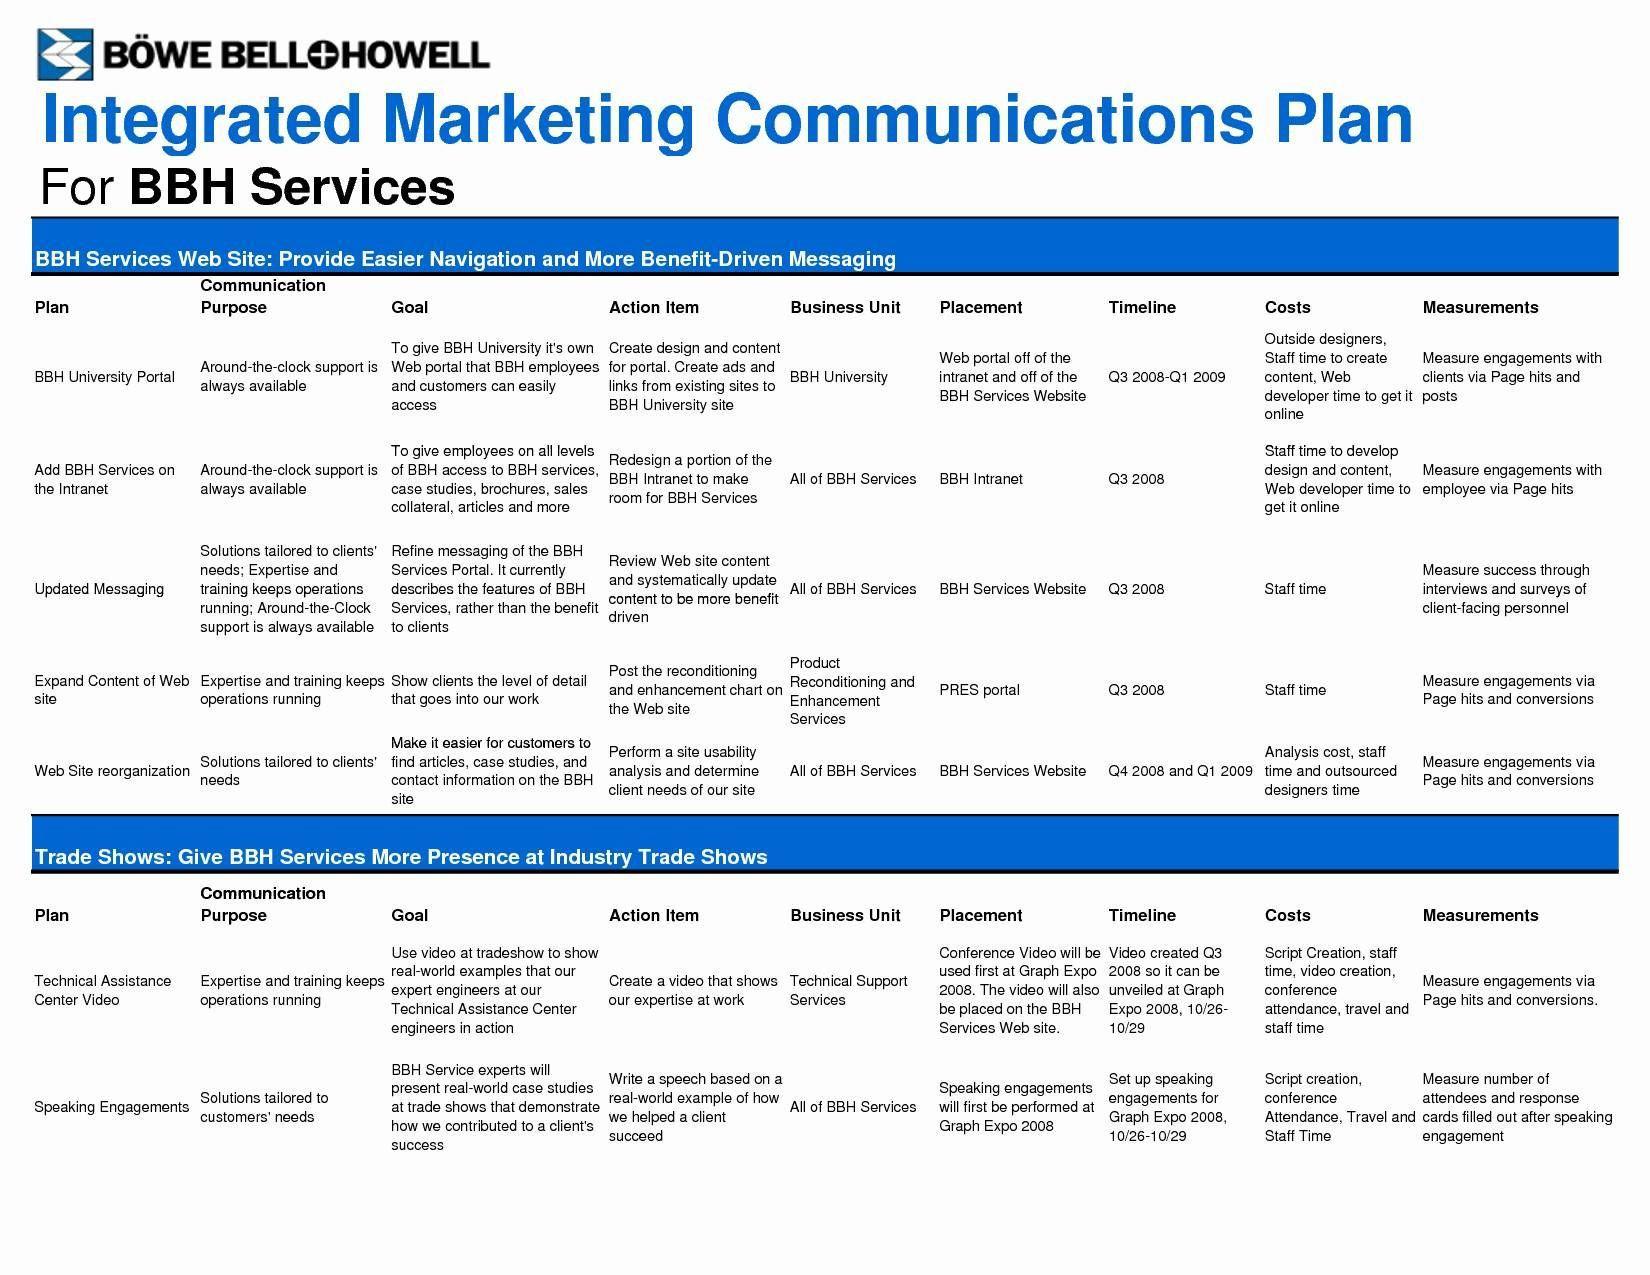 004 Unusual Marketing Communication Plan Template High Definition  Example Pdf Excel IntegratedFull